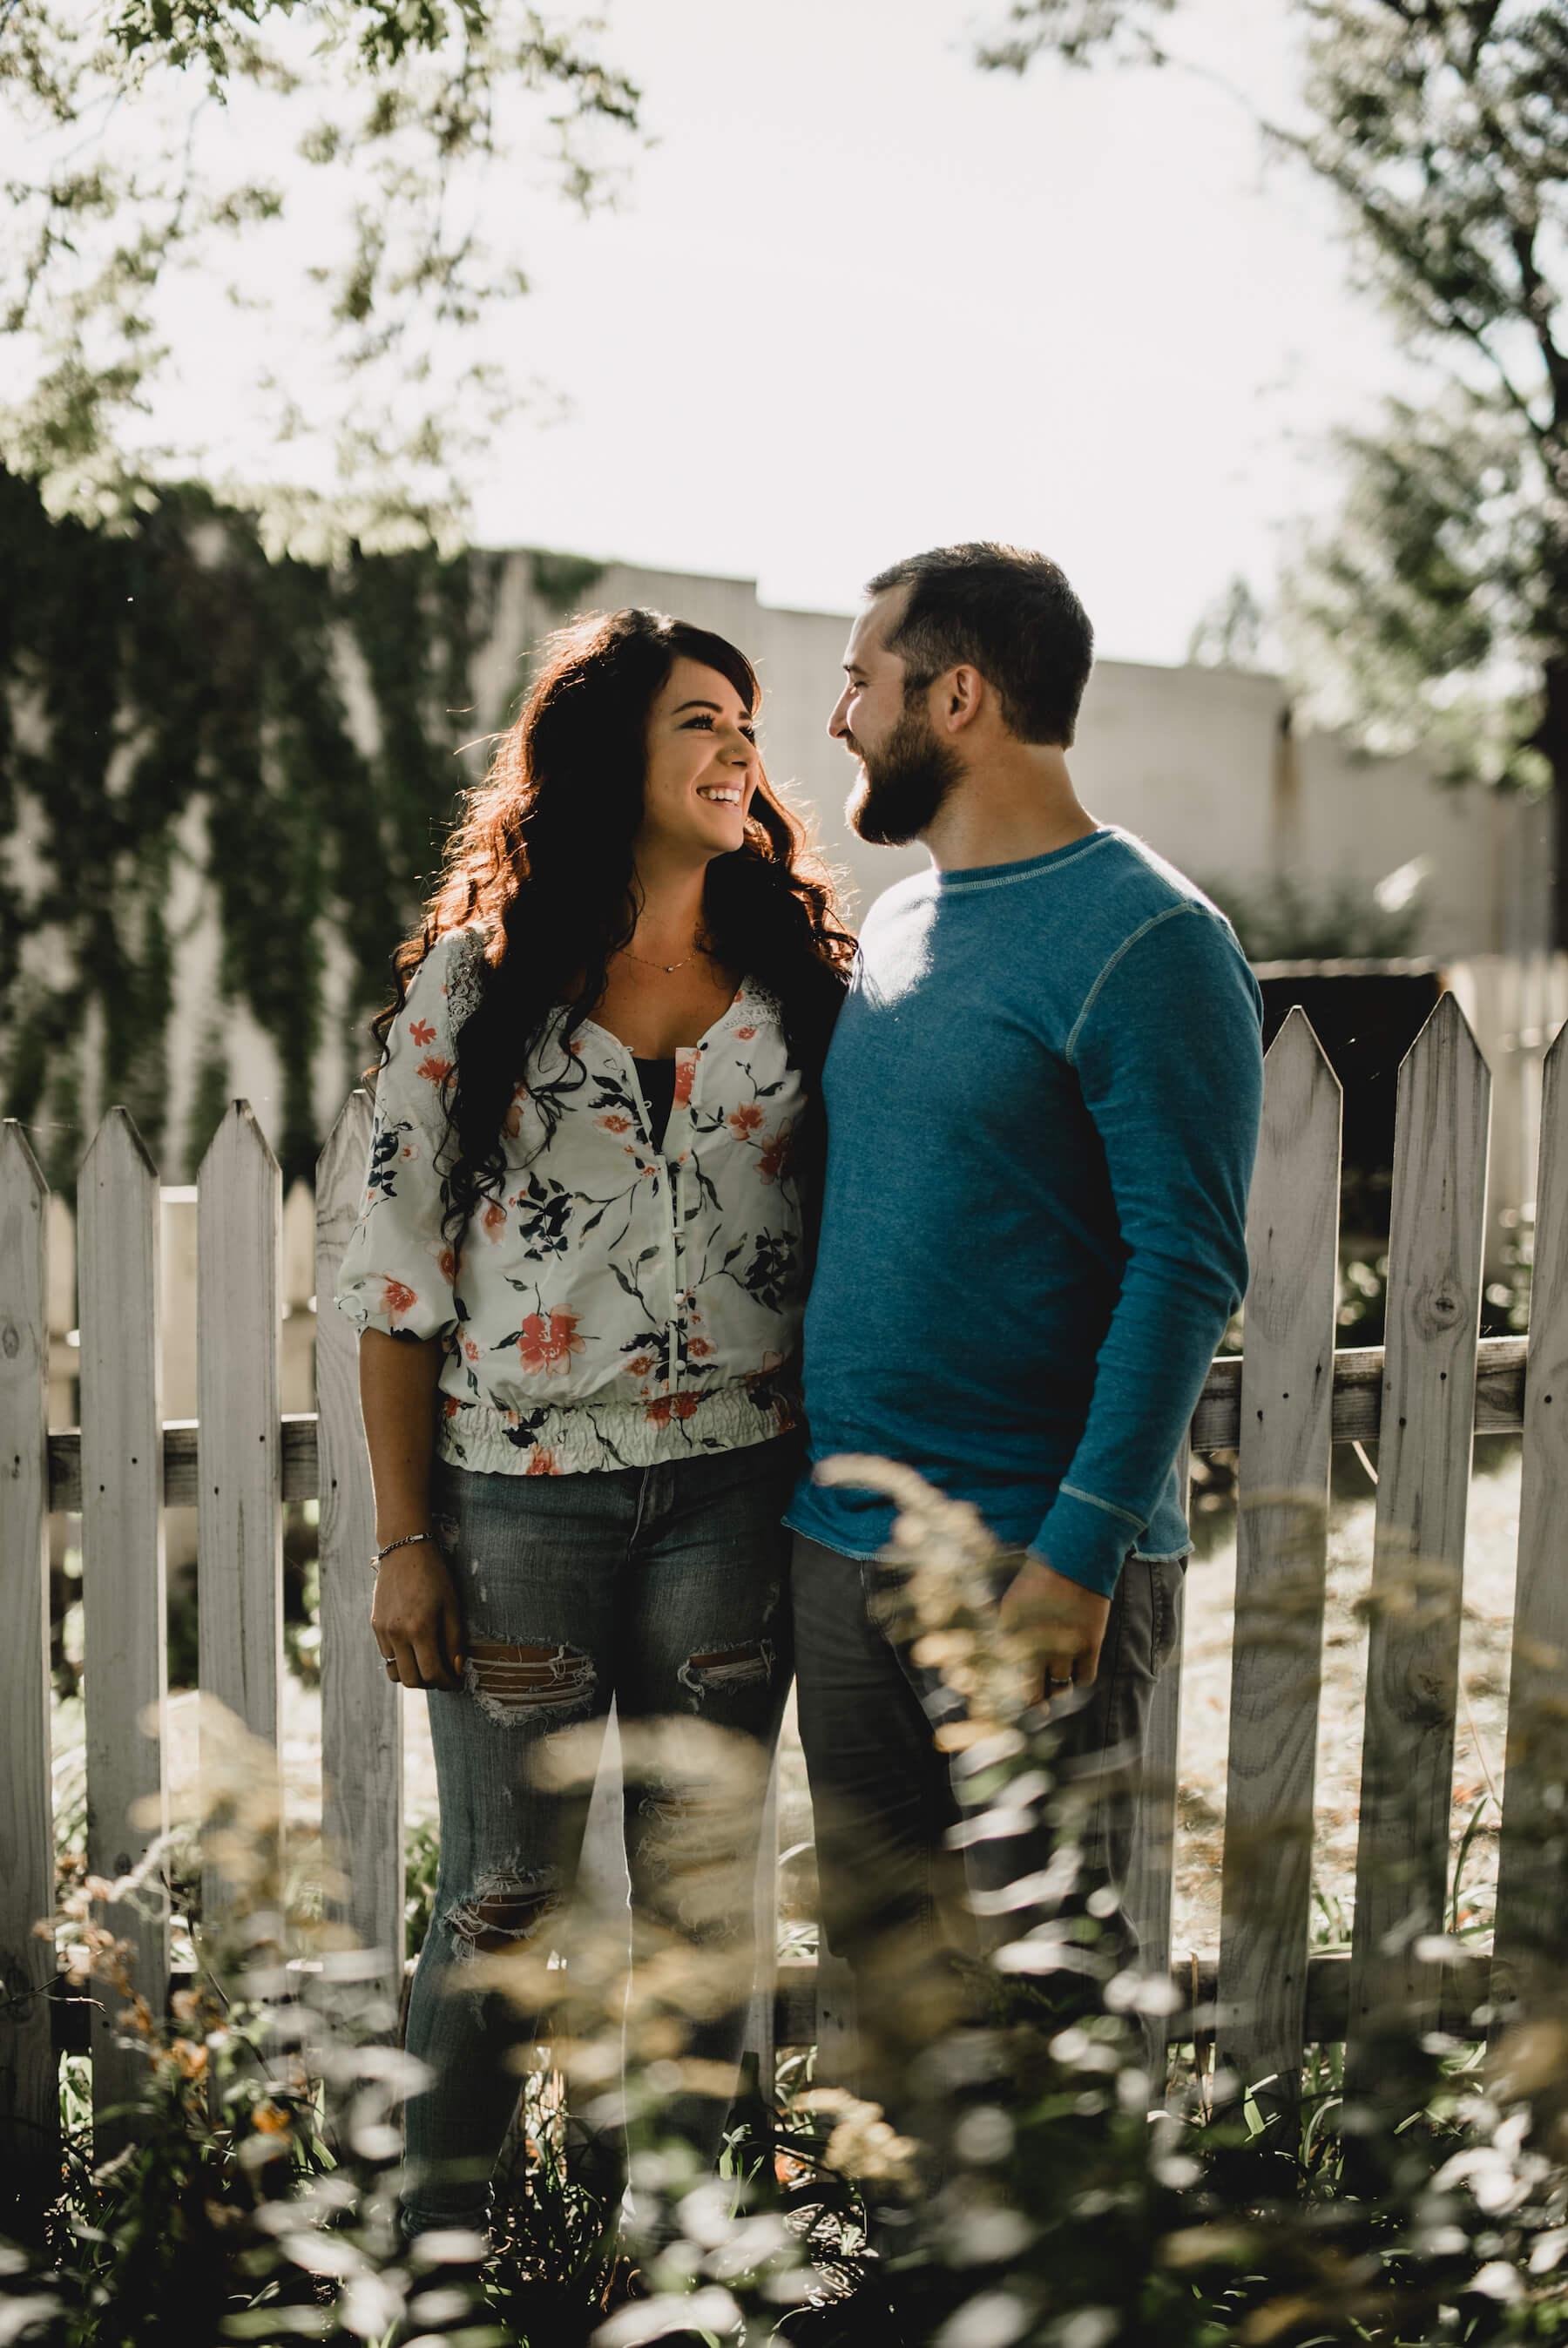 Engle-Olson-Chad-Jen-Engagement-1.jpg